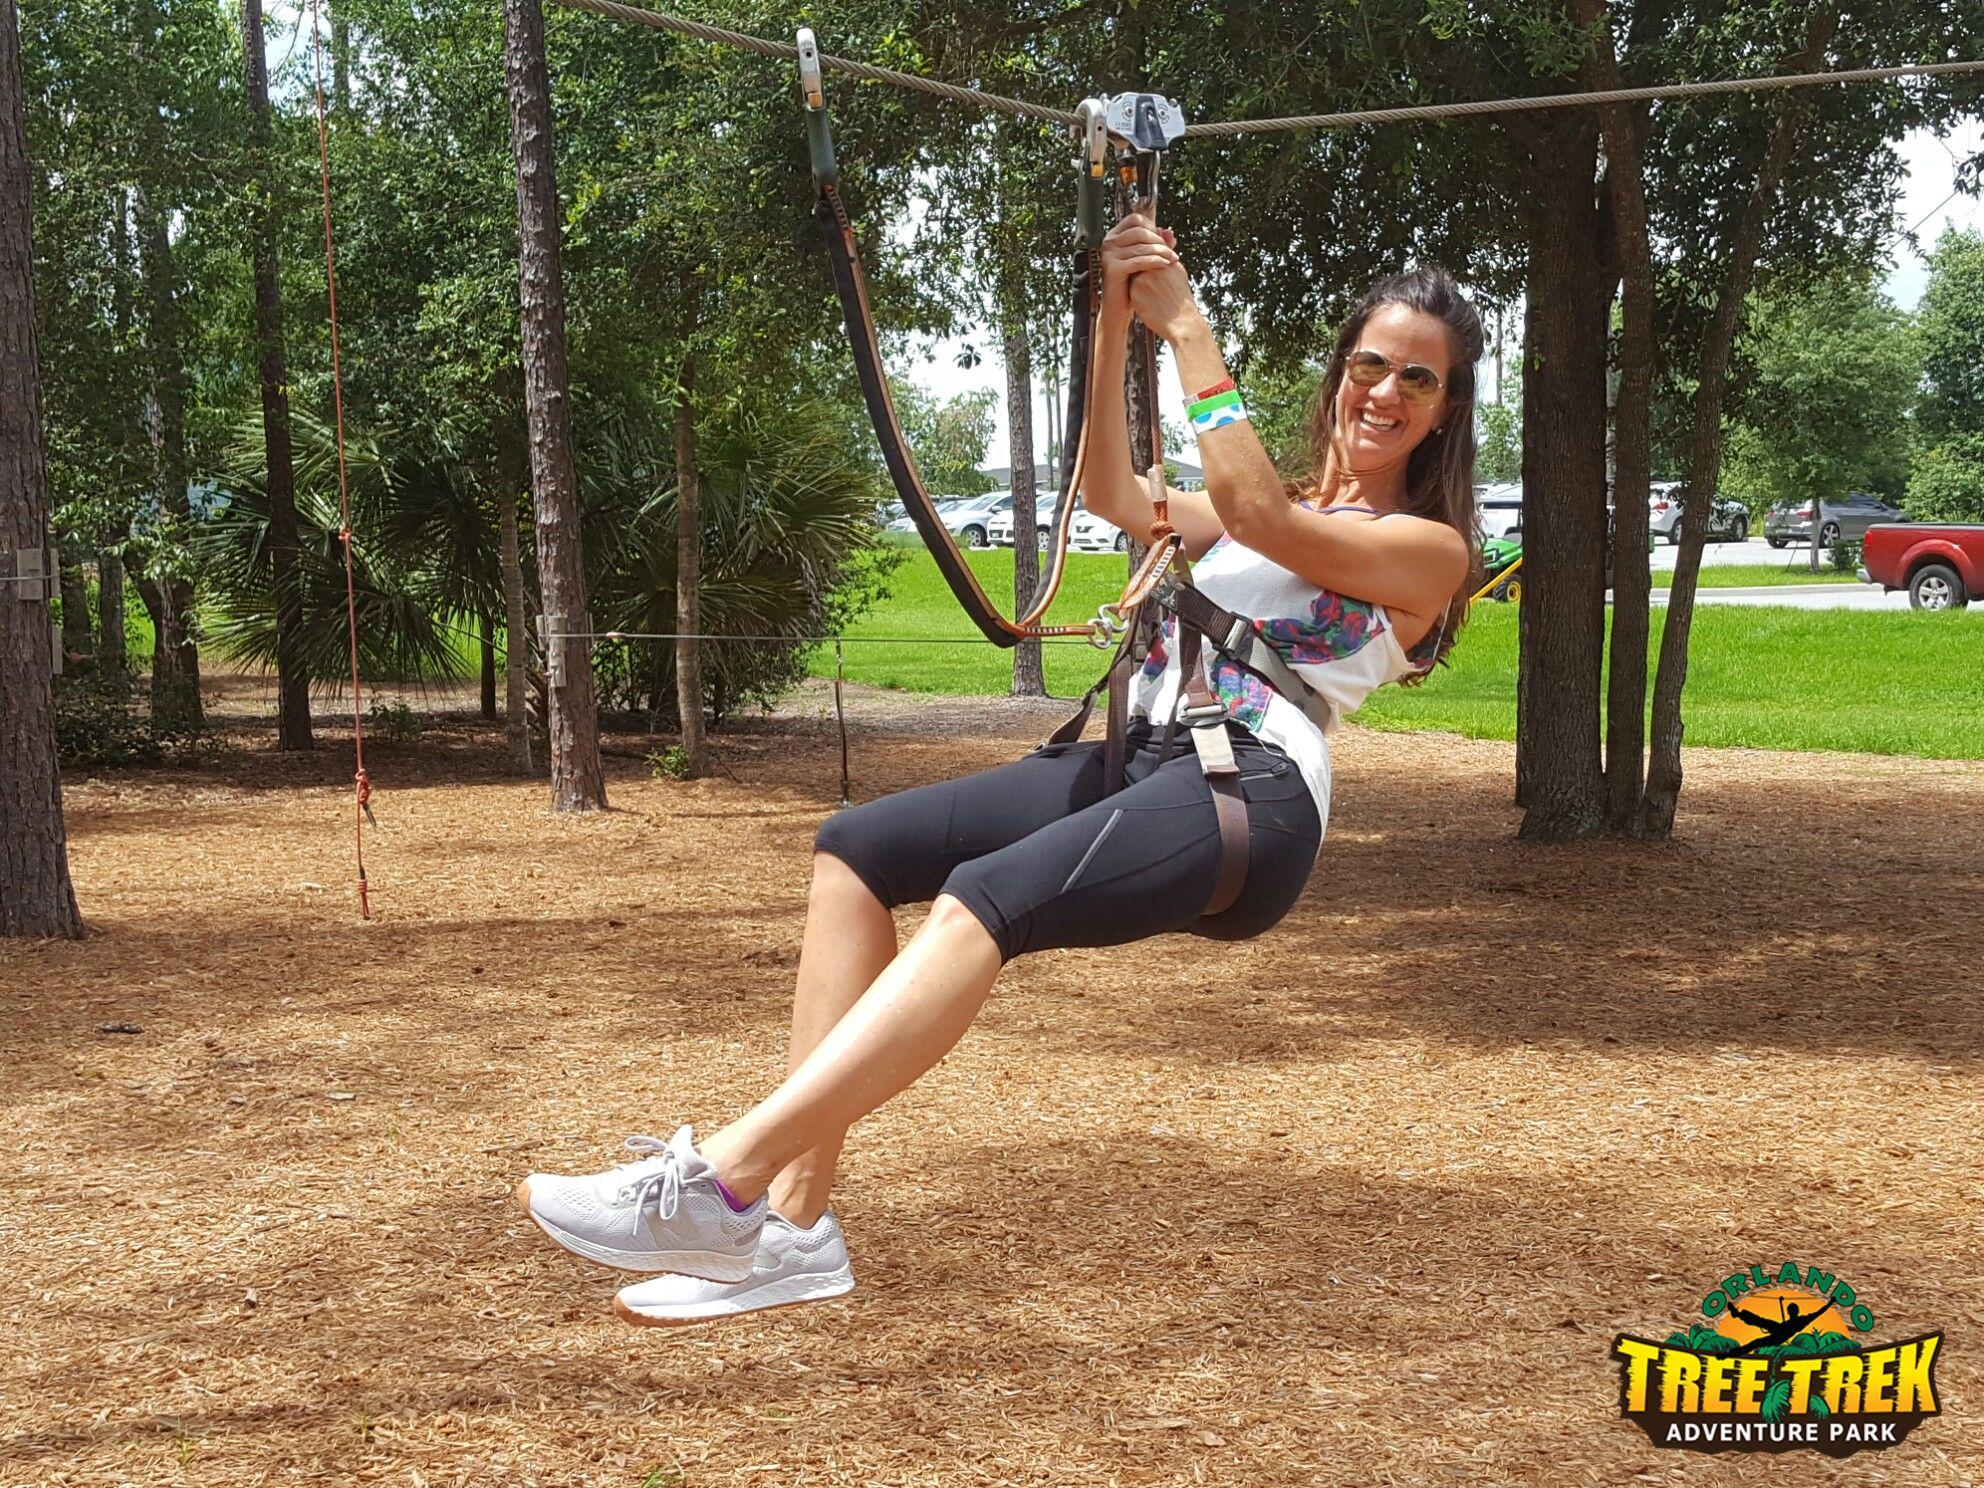 Guests enjoy ziplining throughout the year.